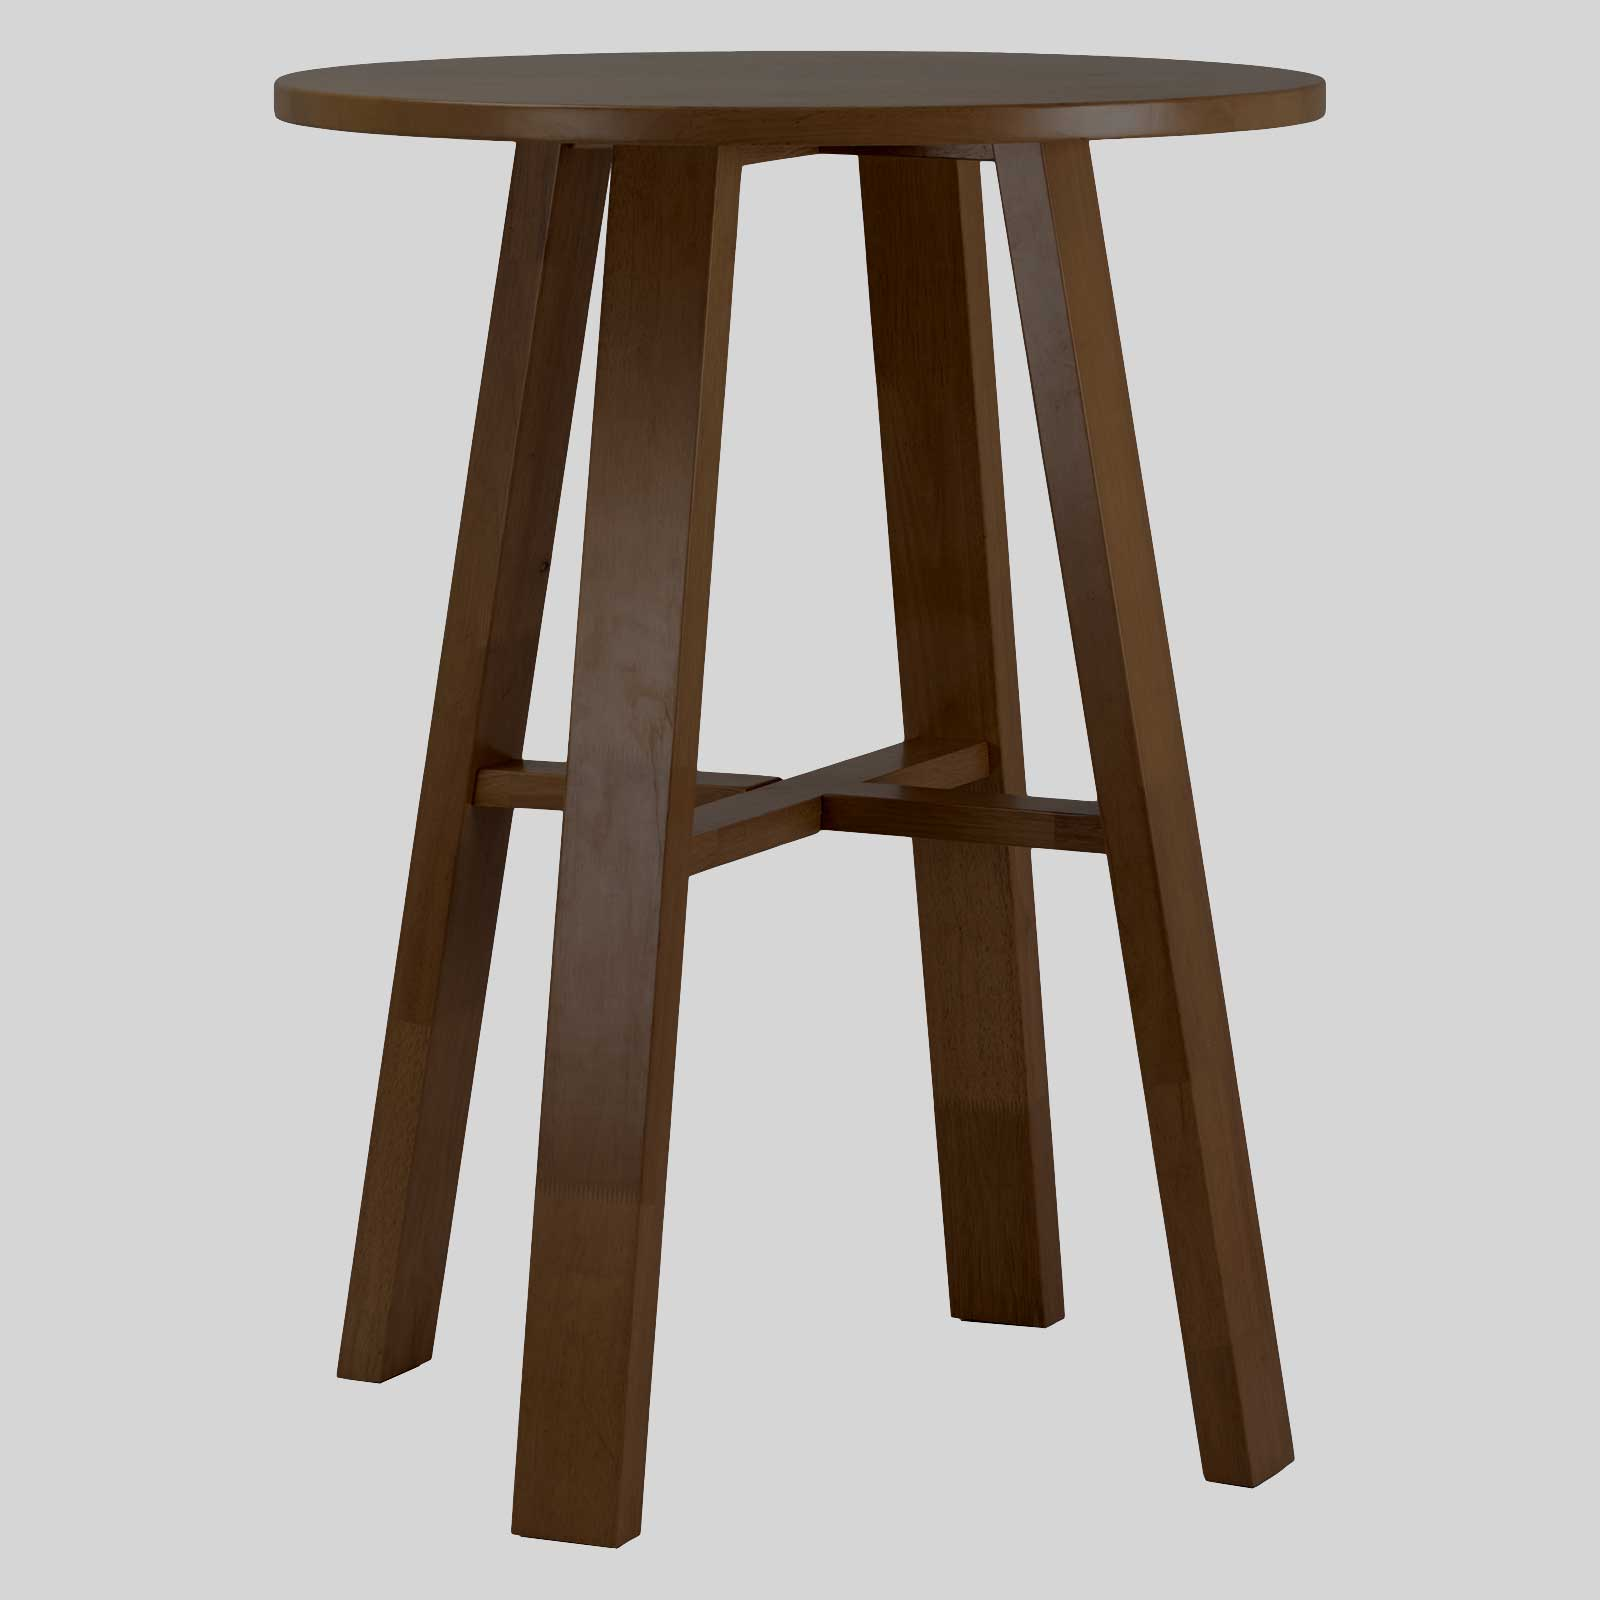 funk wooden bar table walnut - Wooden Bar Table